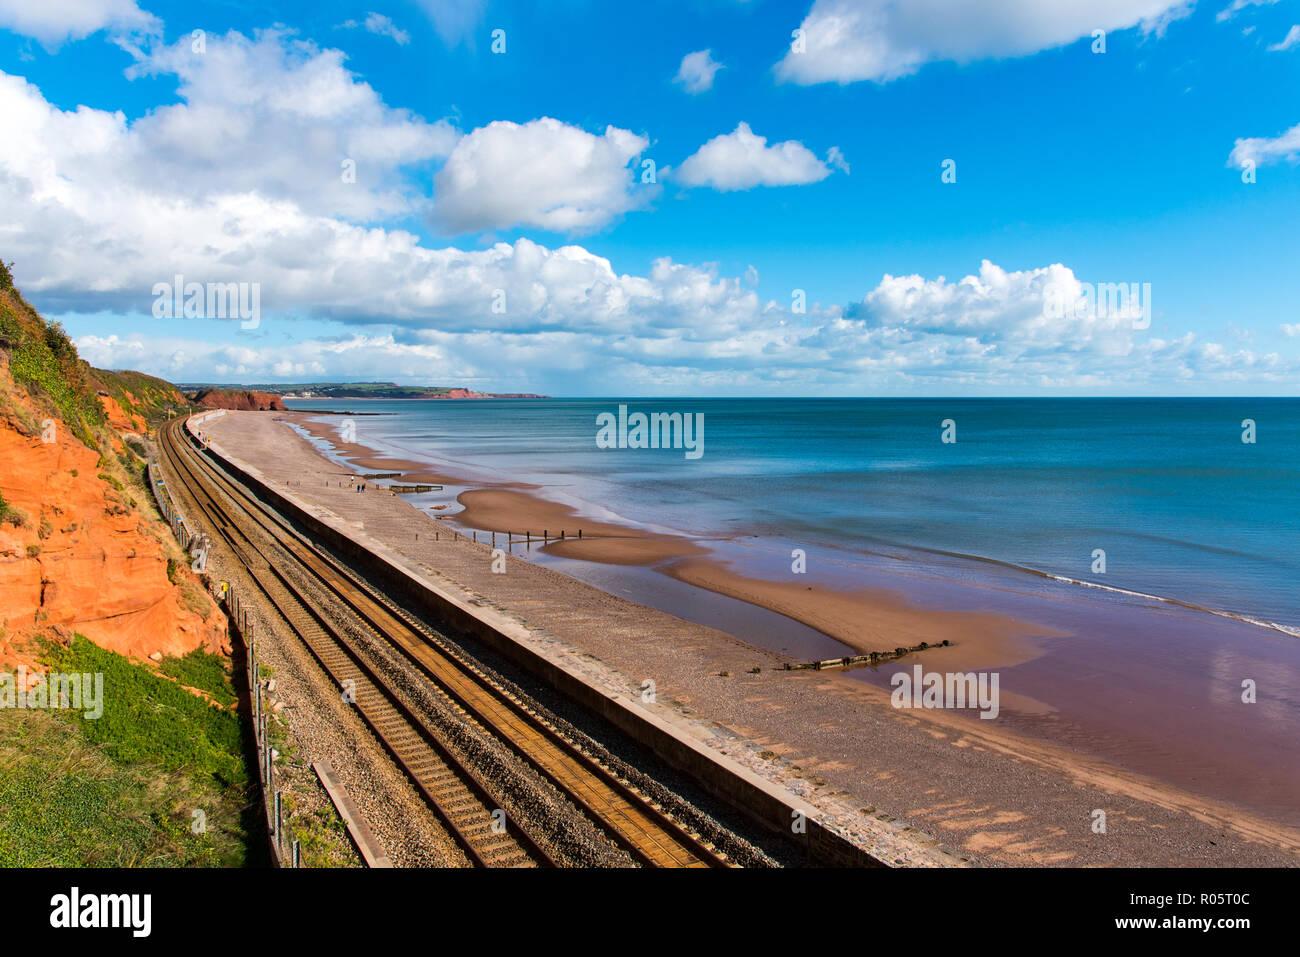 The Devon Main Railway Line near Dawlish. Loking North towards Langstone Rock. - Stock Image